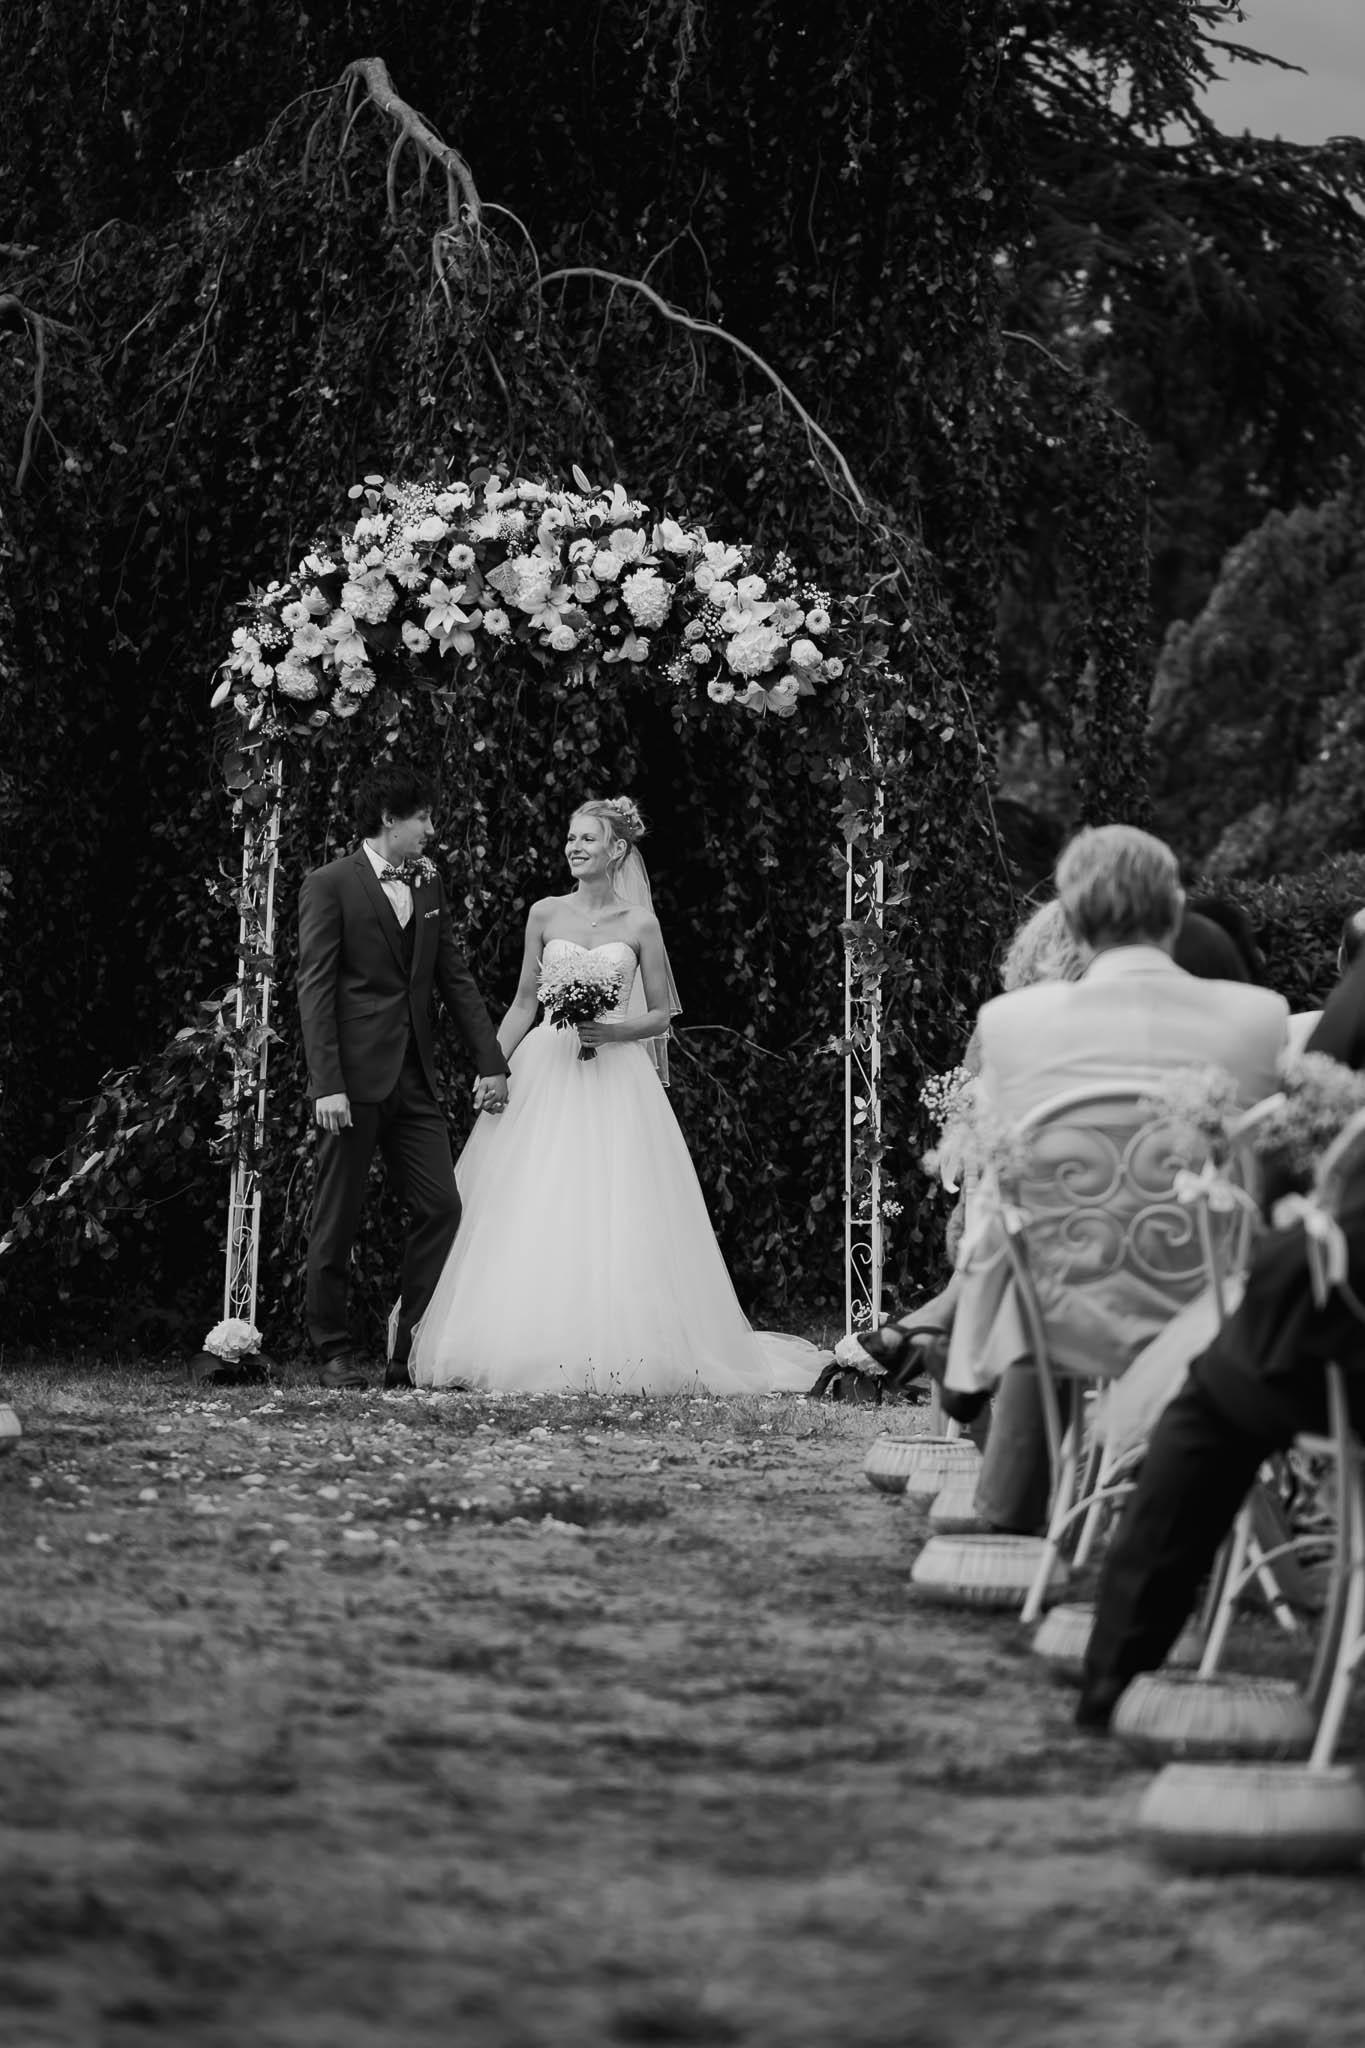 mariage-chateau-gaudras-ingold-36.jpg